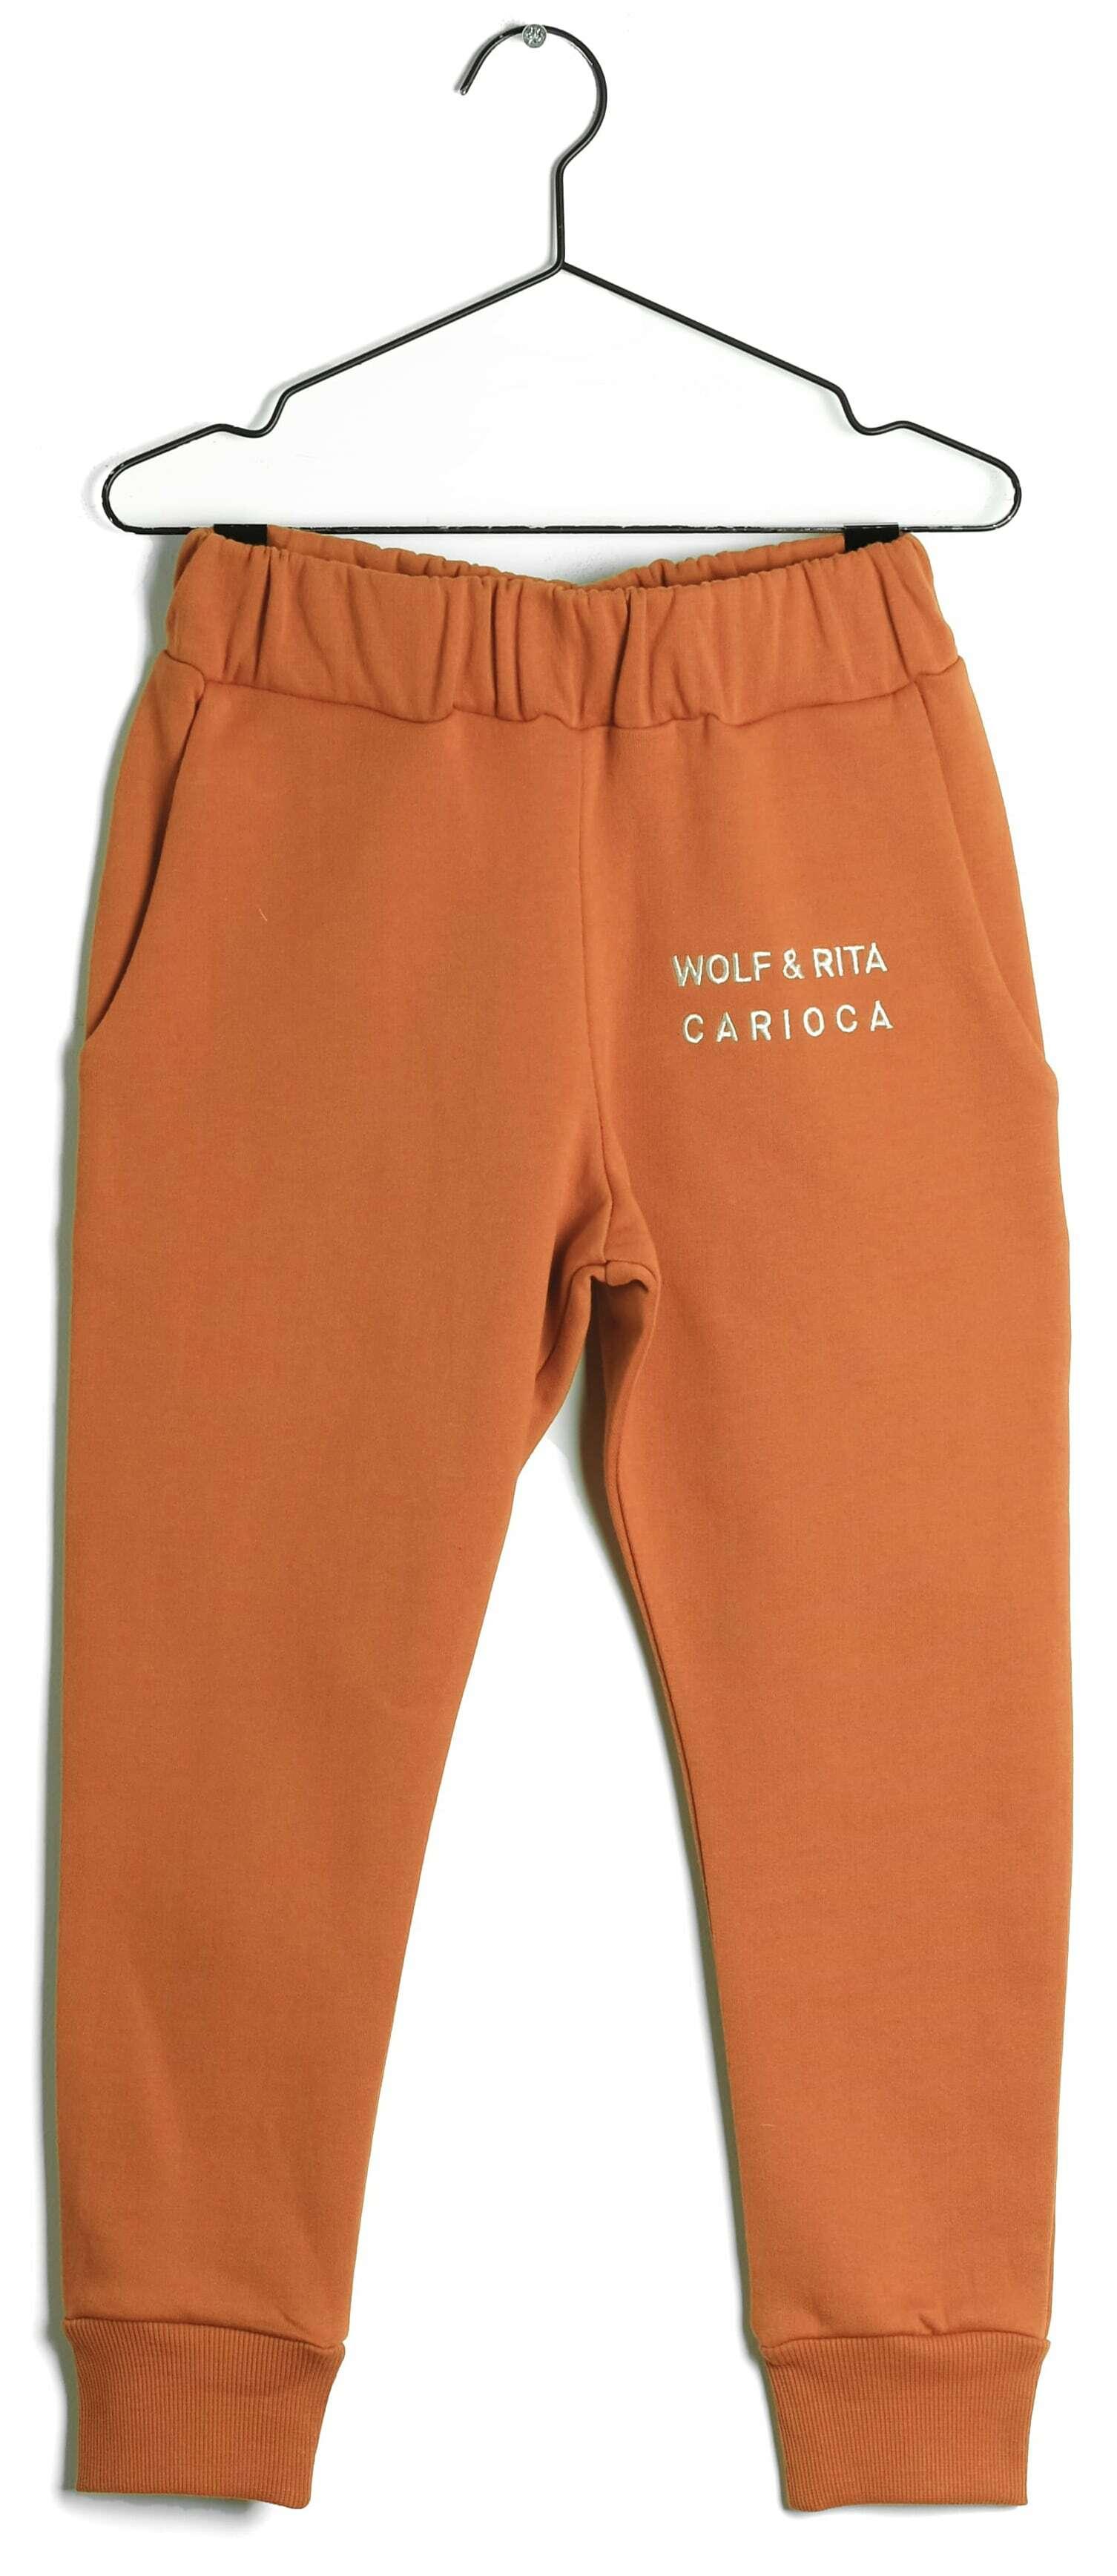 《WOLF & RITA 2019AW》AMADEU trousers / Carioca